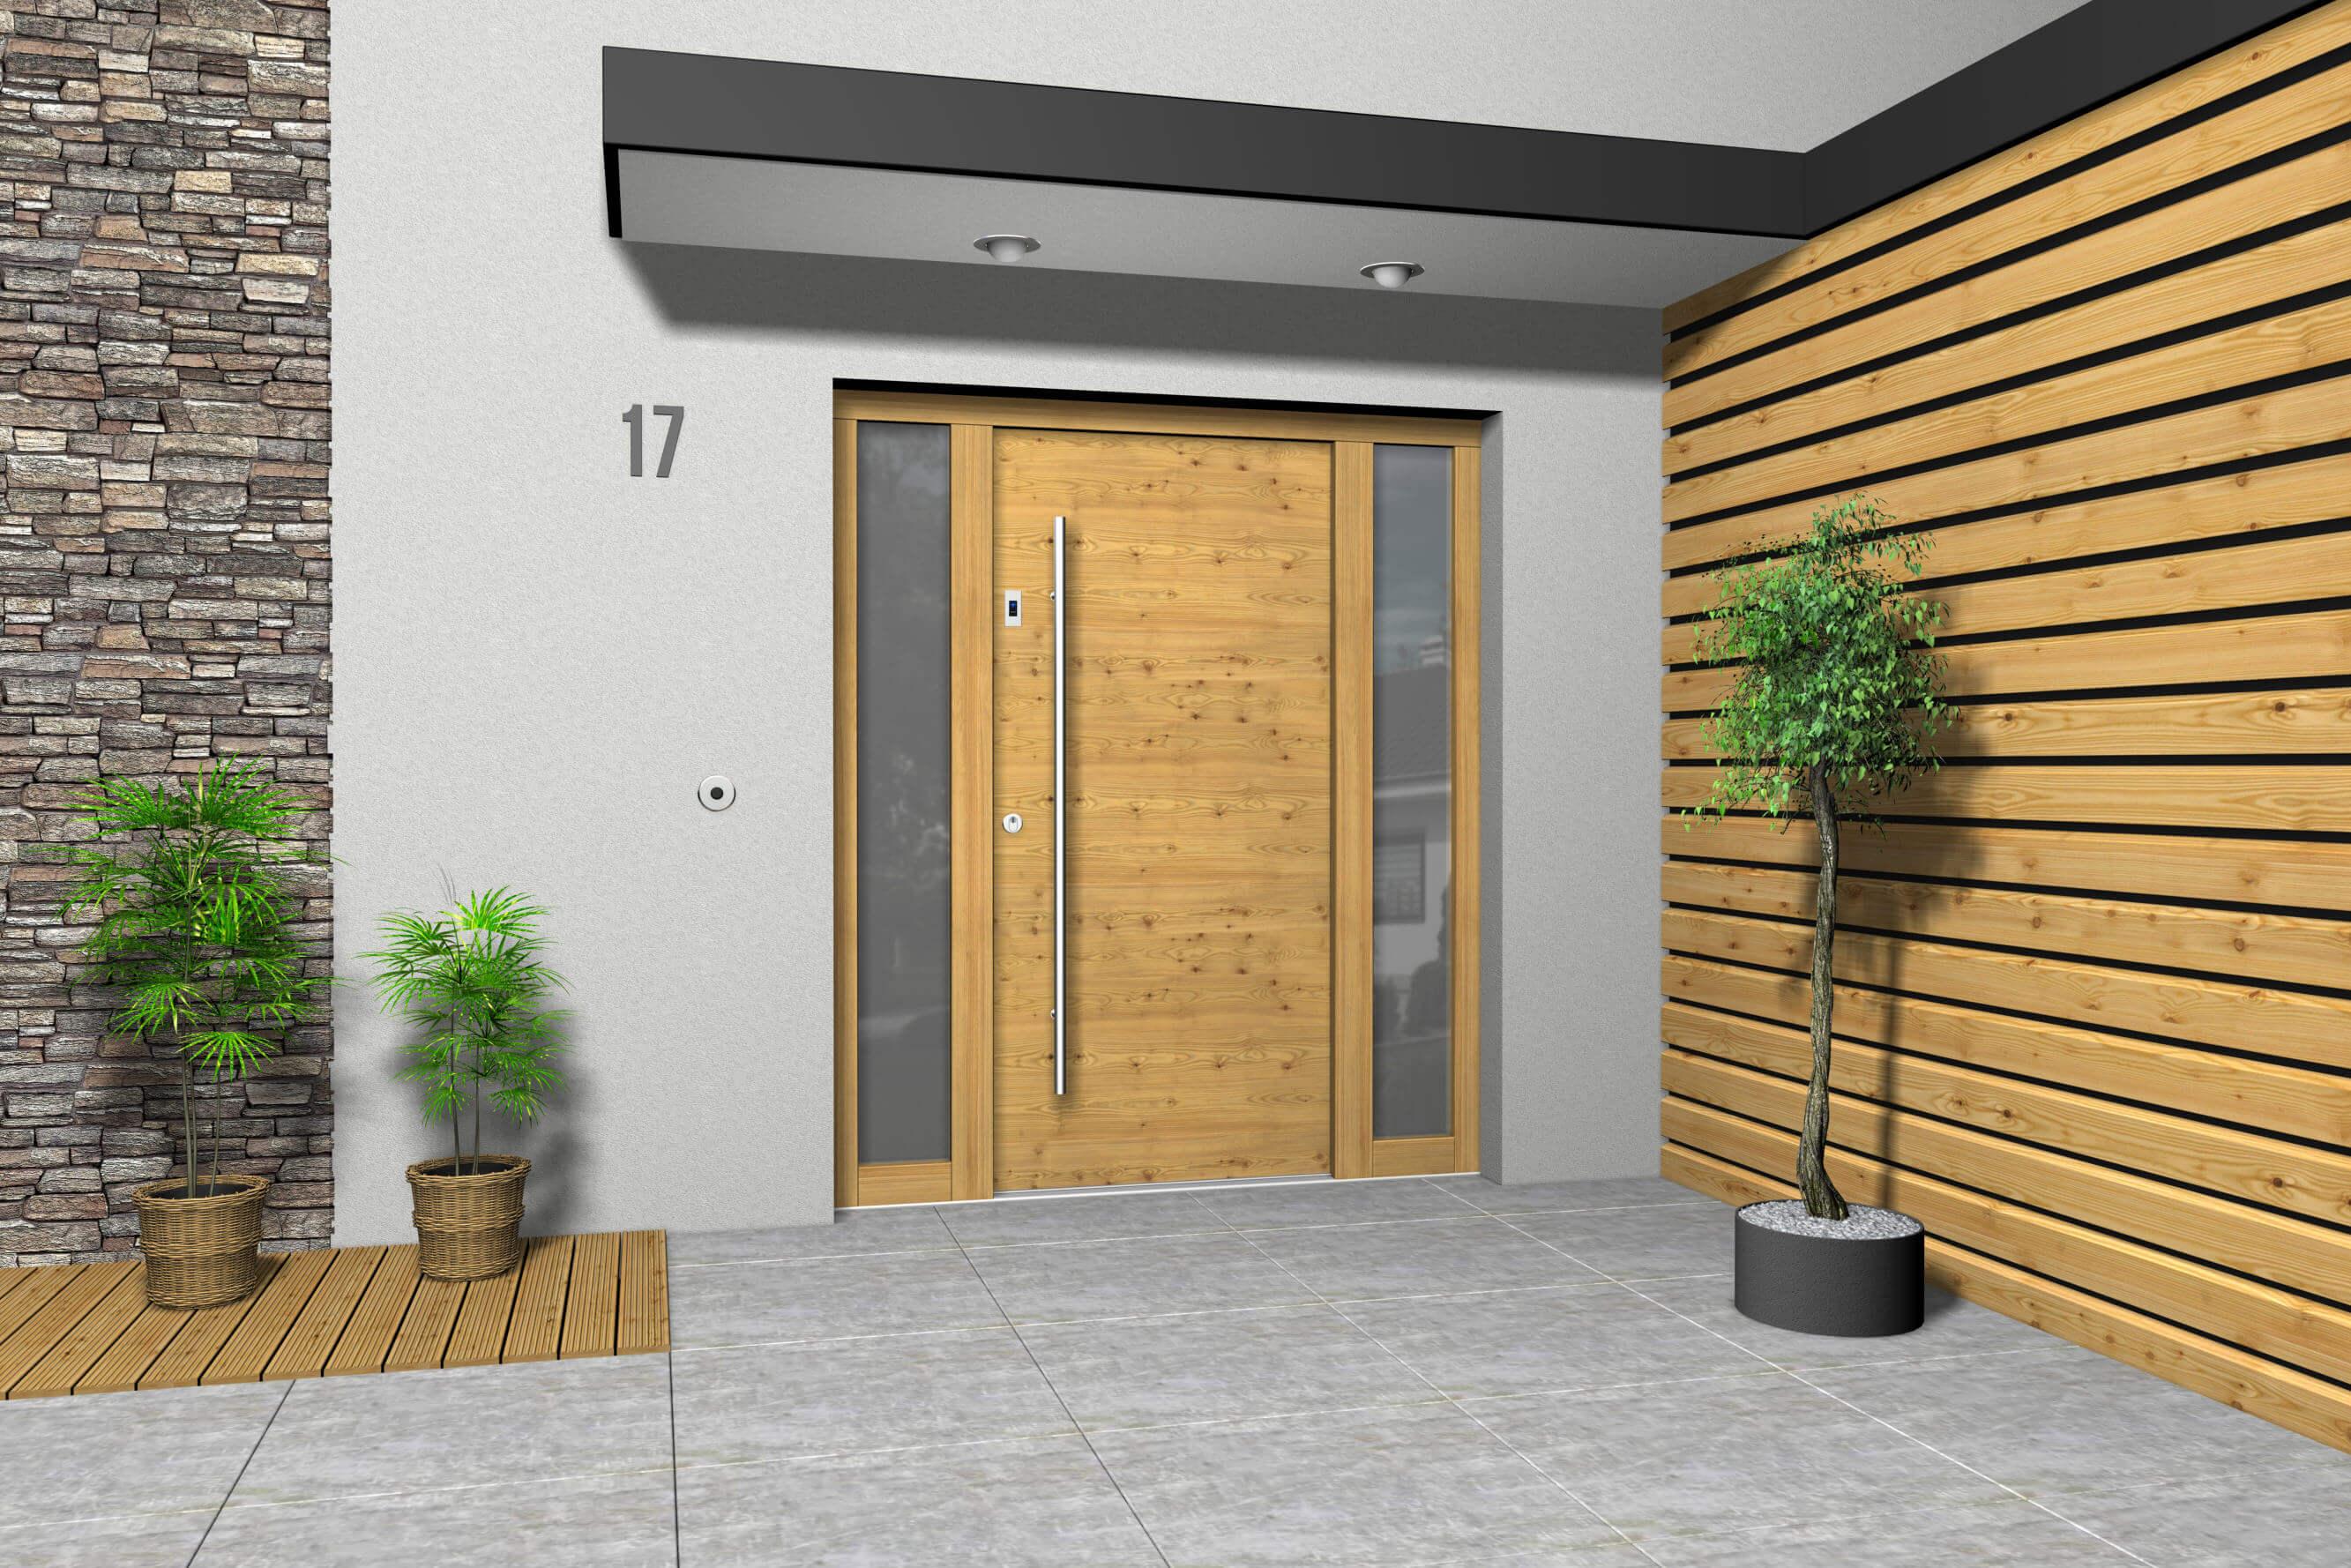 Haustüren modern holz  Haustüren Holz Exclusiv - KS-Hausbau24